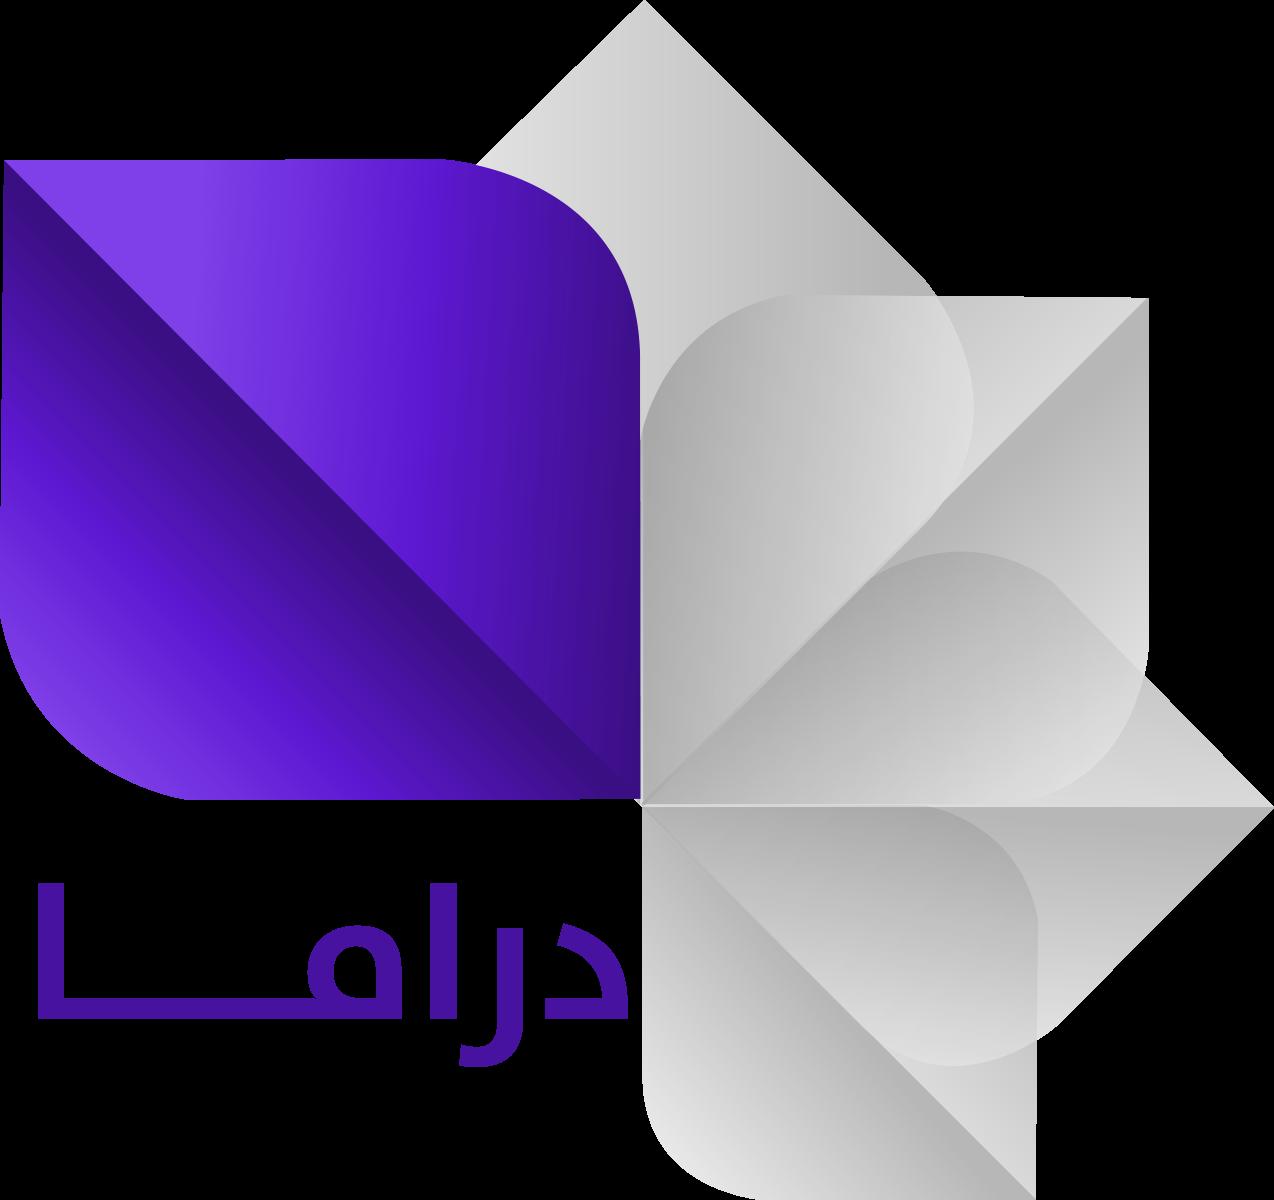 تردد قناة سوريا دراما في رمضان 2019 Gaming Logos Nintendo Wii Logo Nintendo Wii